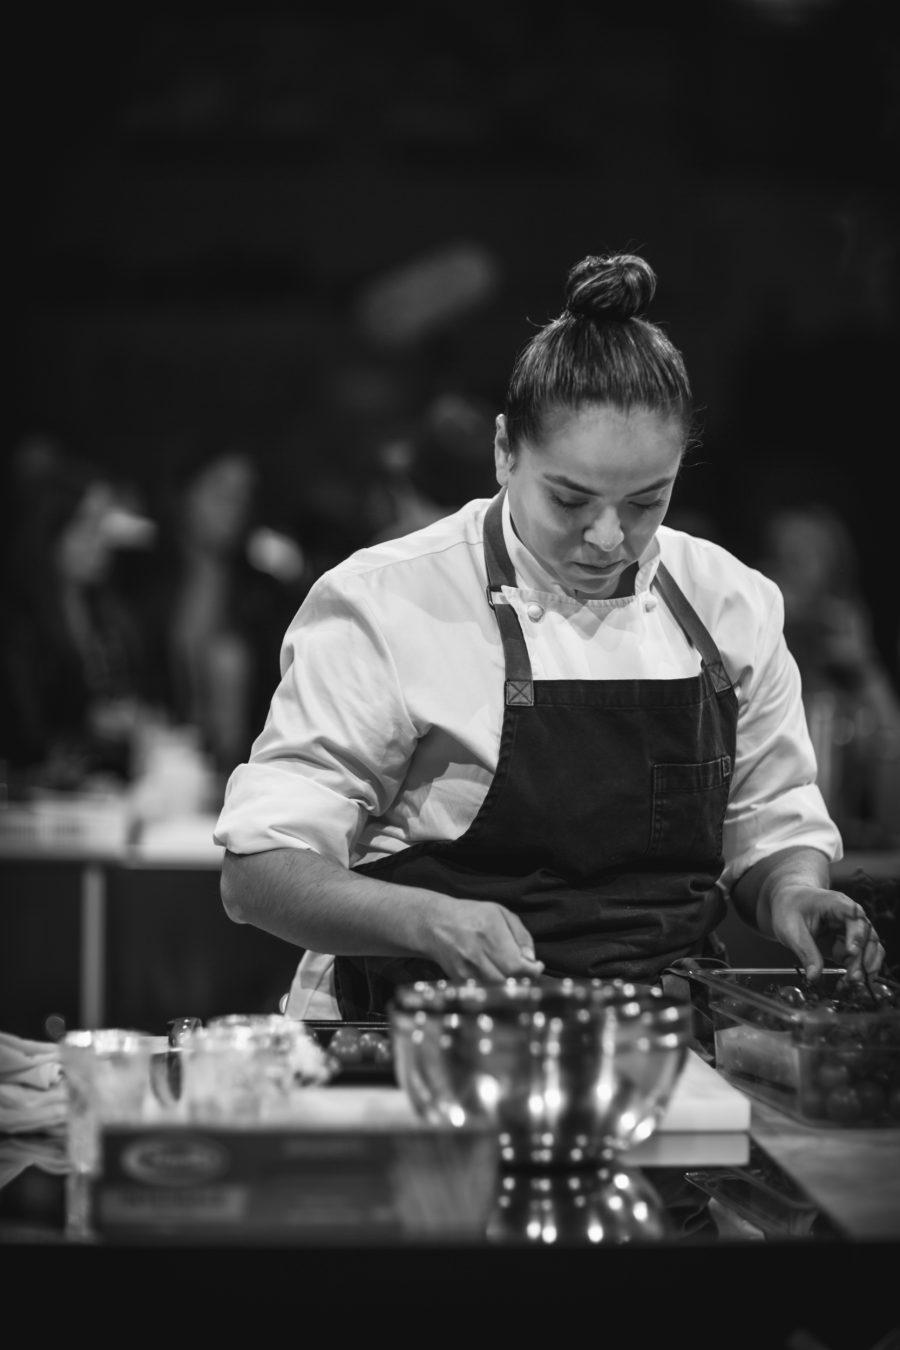 Barilla Pasta World Championship by Eva Kosmas Flores